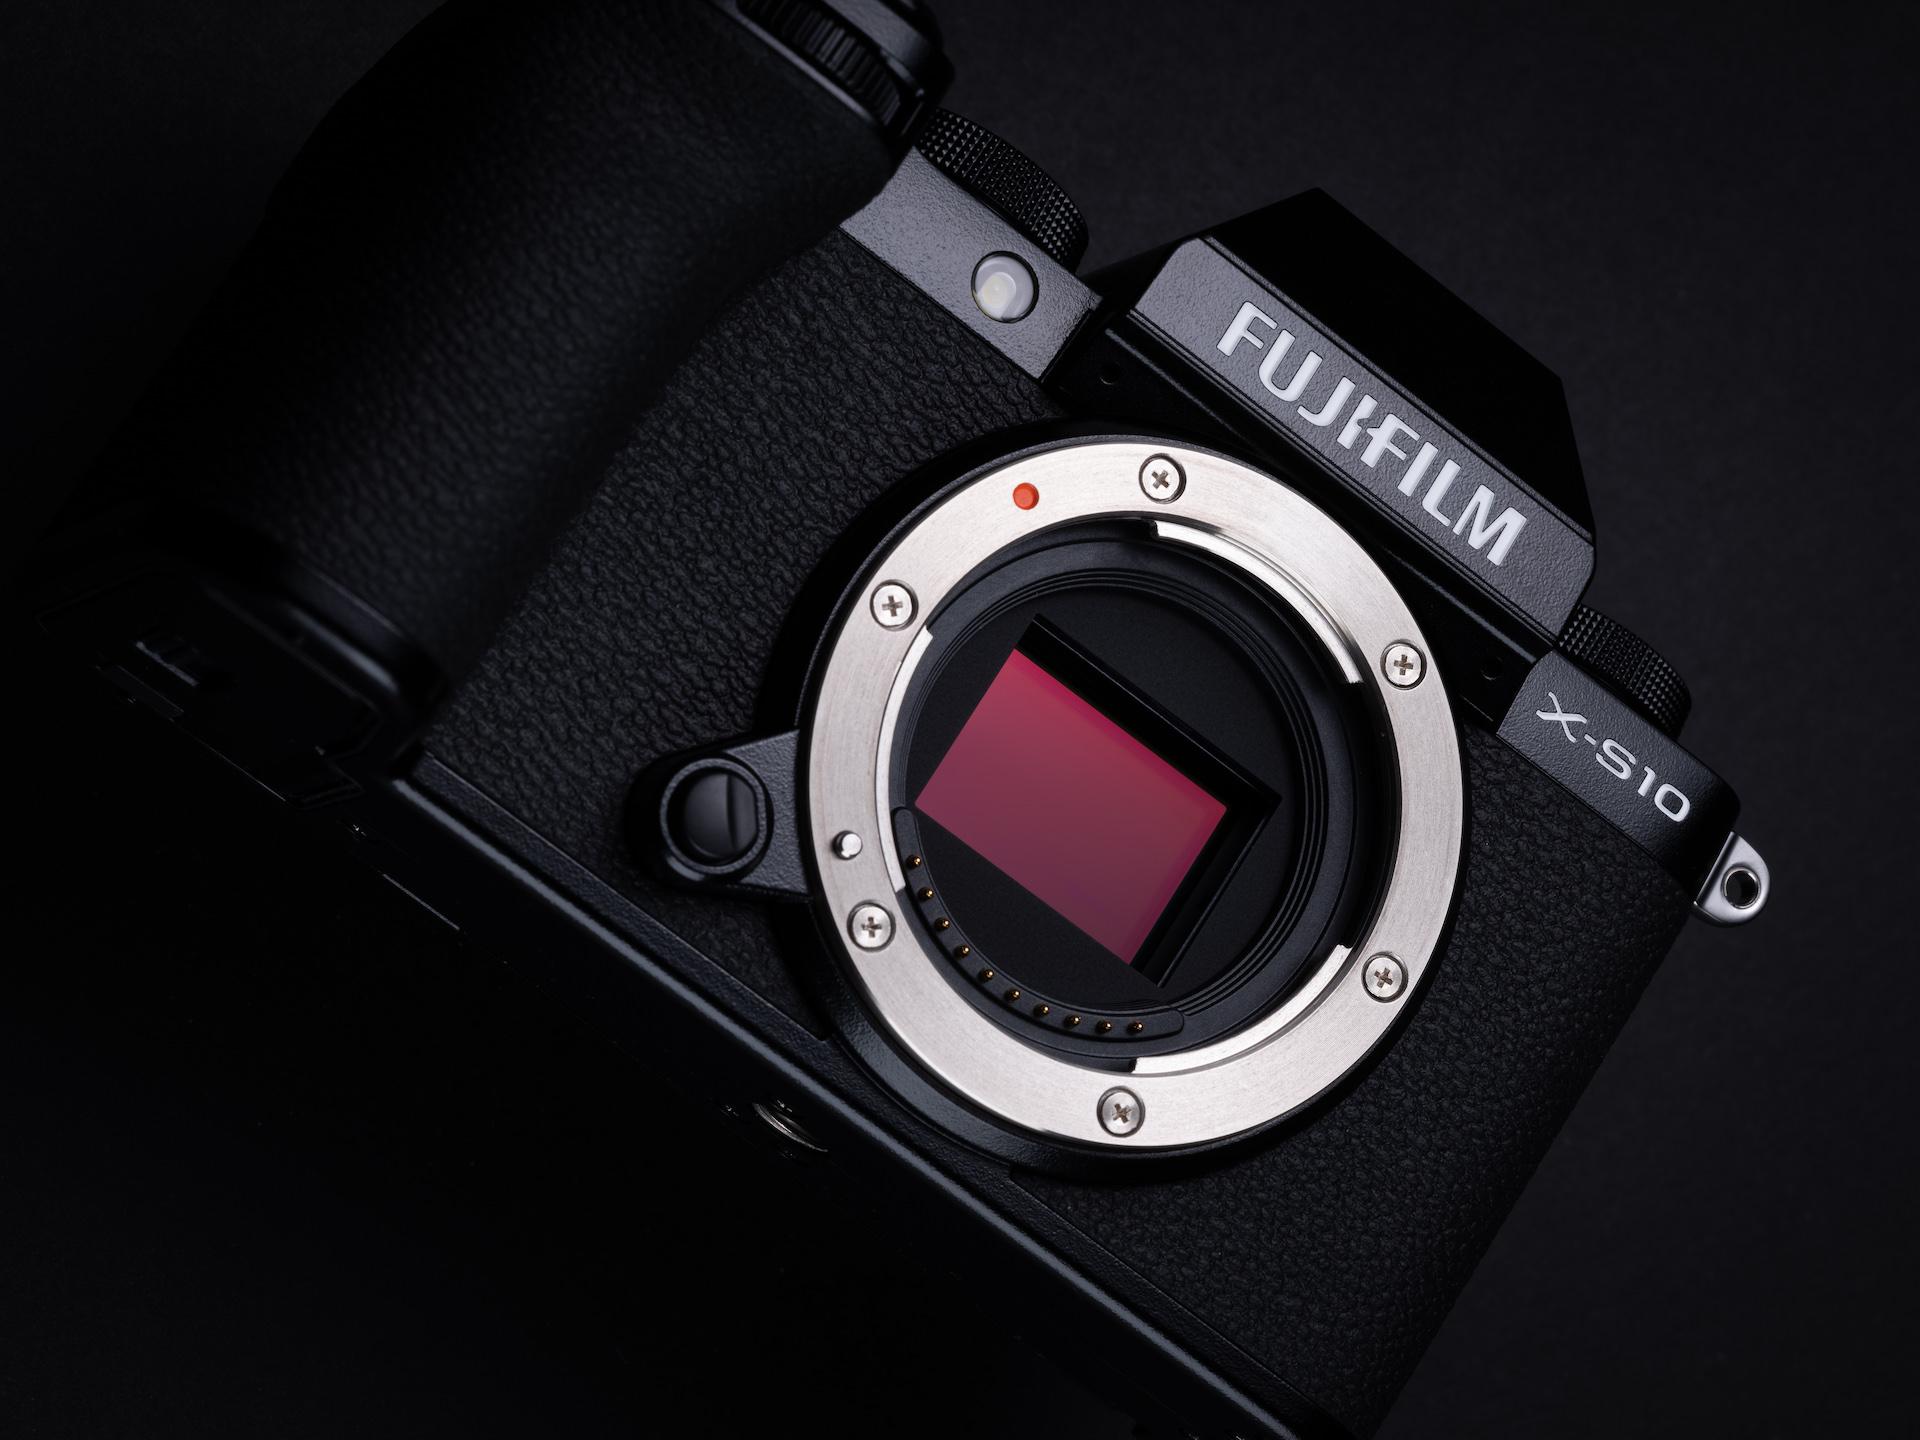 productshot Fujifilm X-S10 sensor